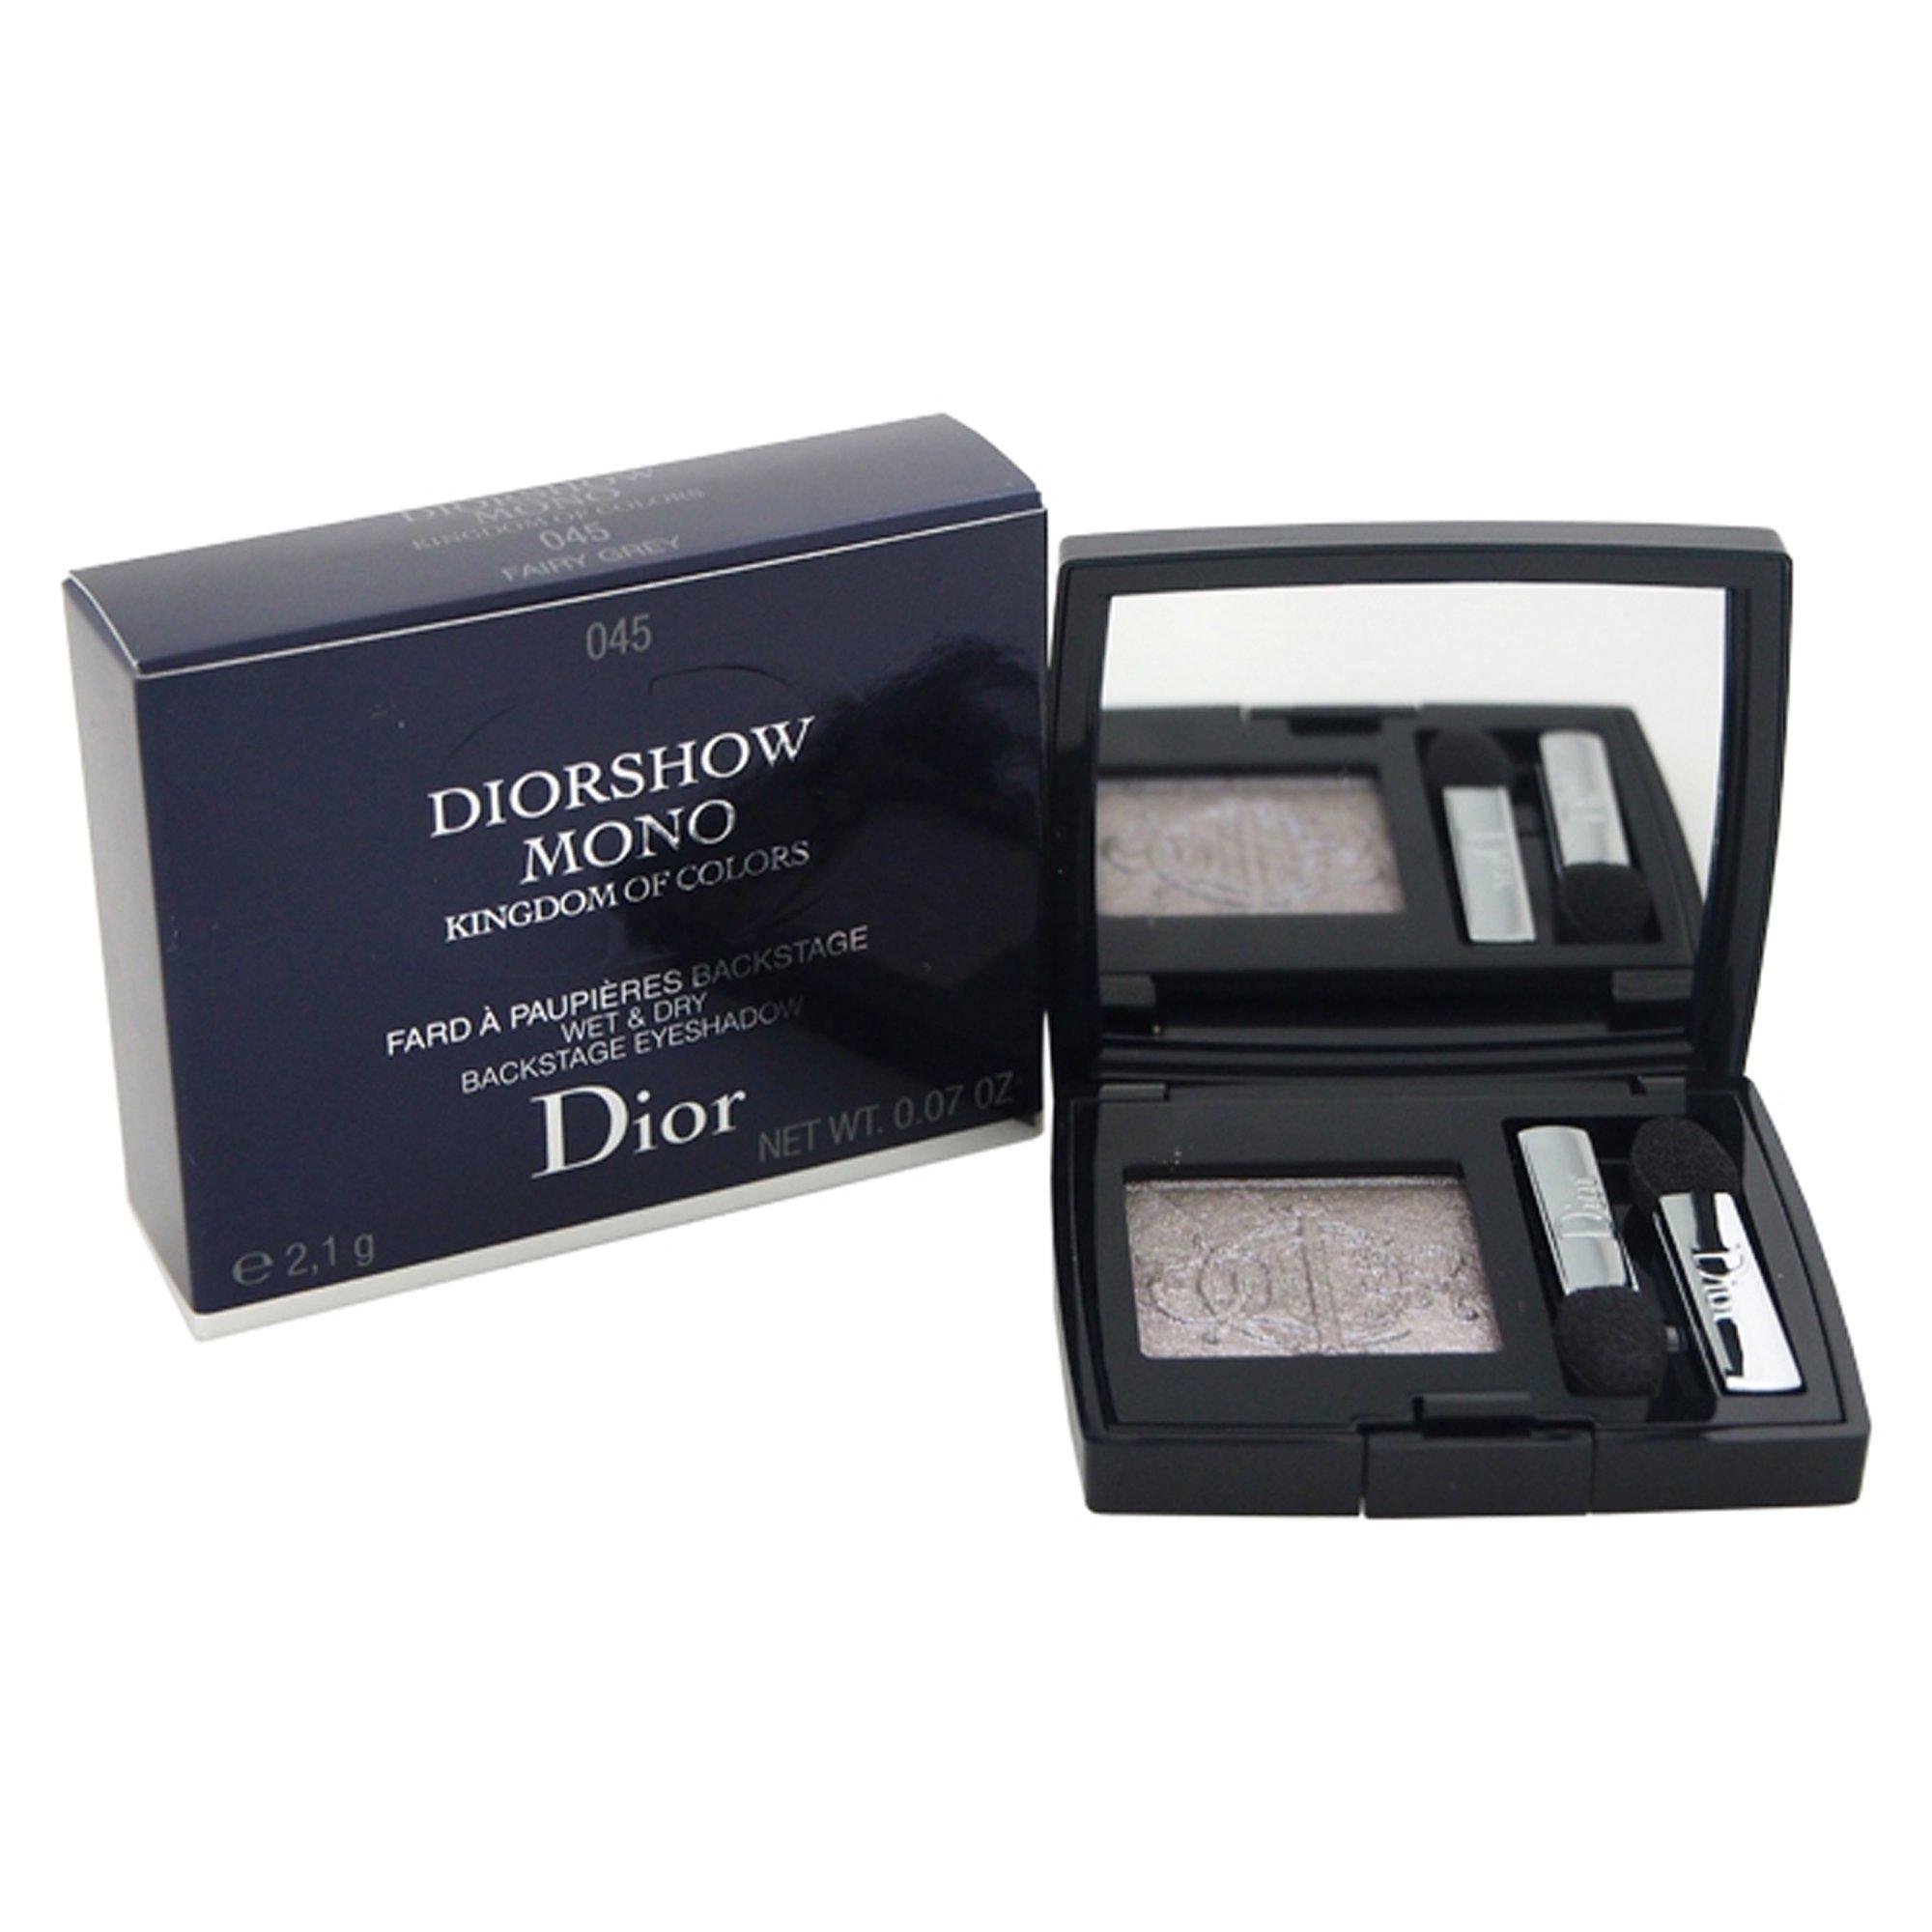 Christian Dior Diorshow Mono Eye Shadow for Women, 045 Kingdom Of Colours, 0.22 Ounce